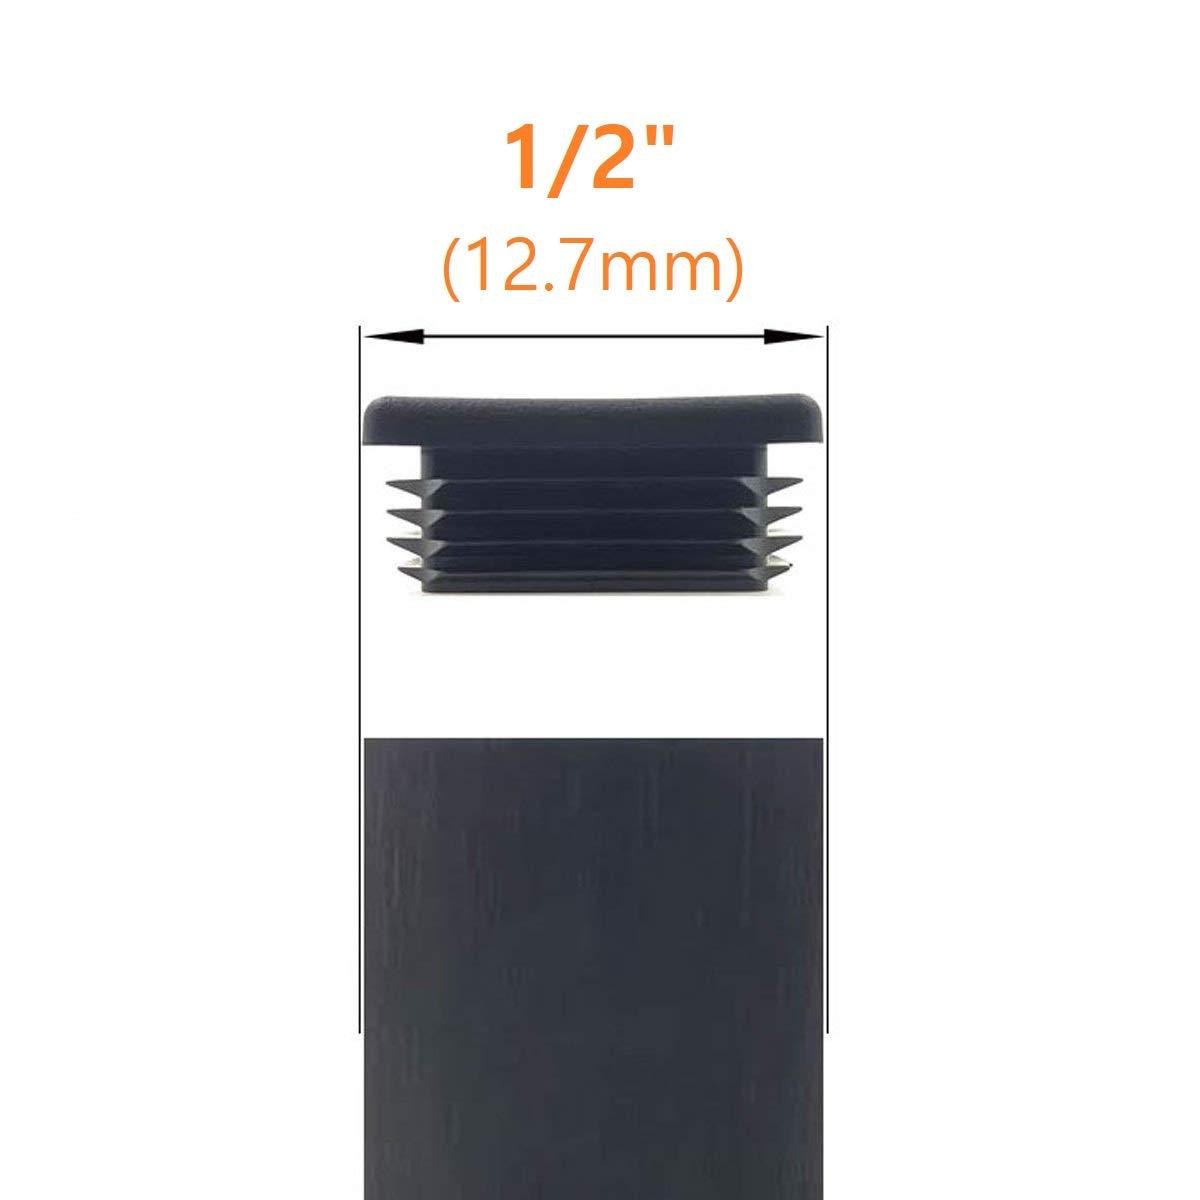 0.050 Projection 0.005 Tool Radius 2-1//2 Overall Length 0.200 Minimum Bore Diameter Solid Carbide Tool Micro 100 1.100 Maximum Bore Depth BB-2001100 Right Hand Cutting Radius Boring Tool 1//4 Shank Diameter